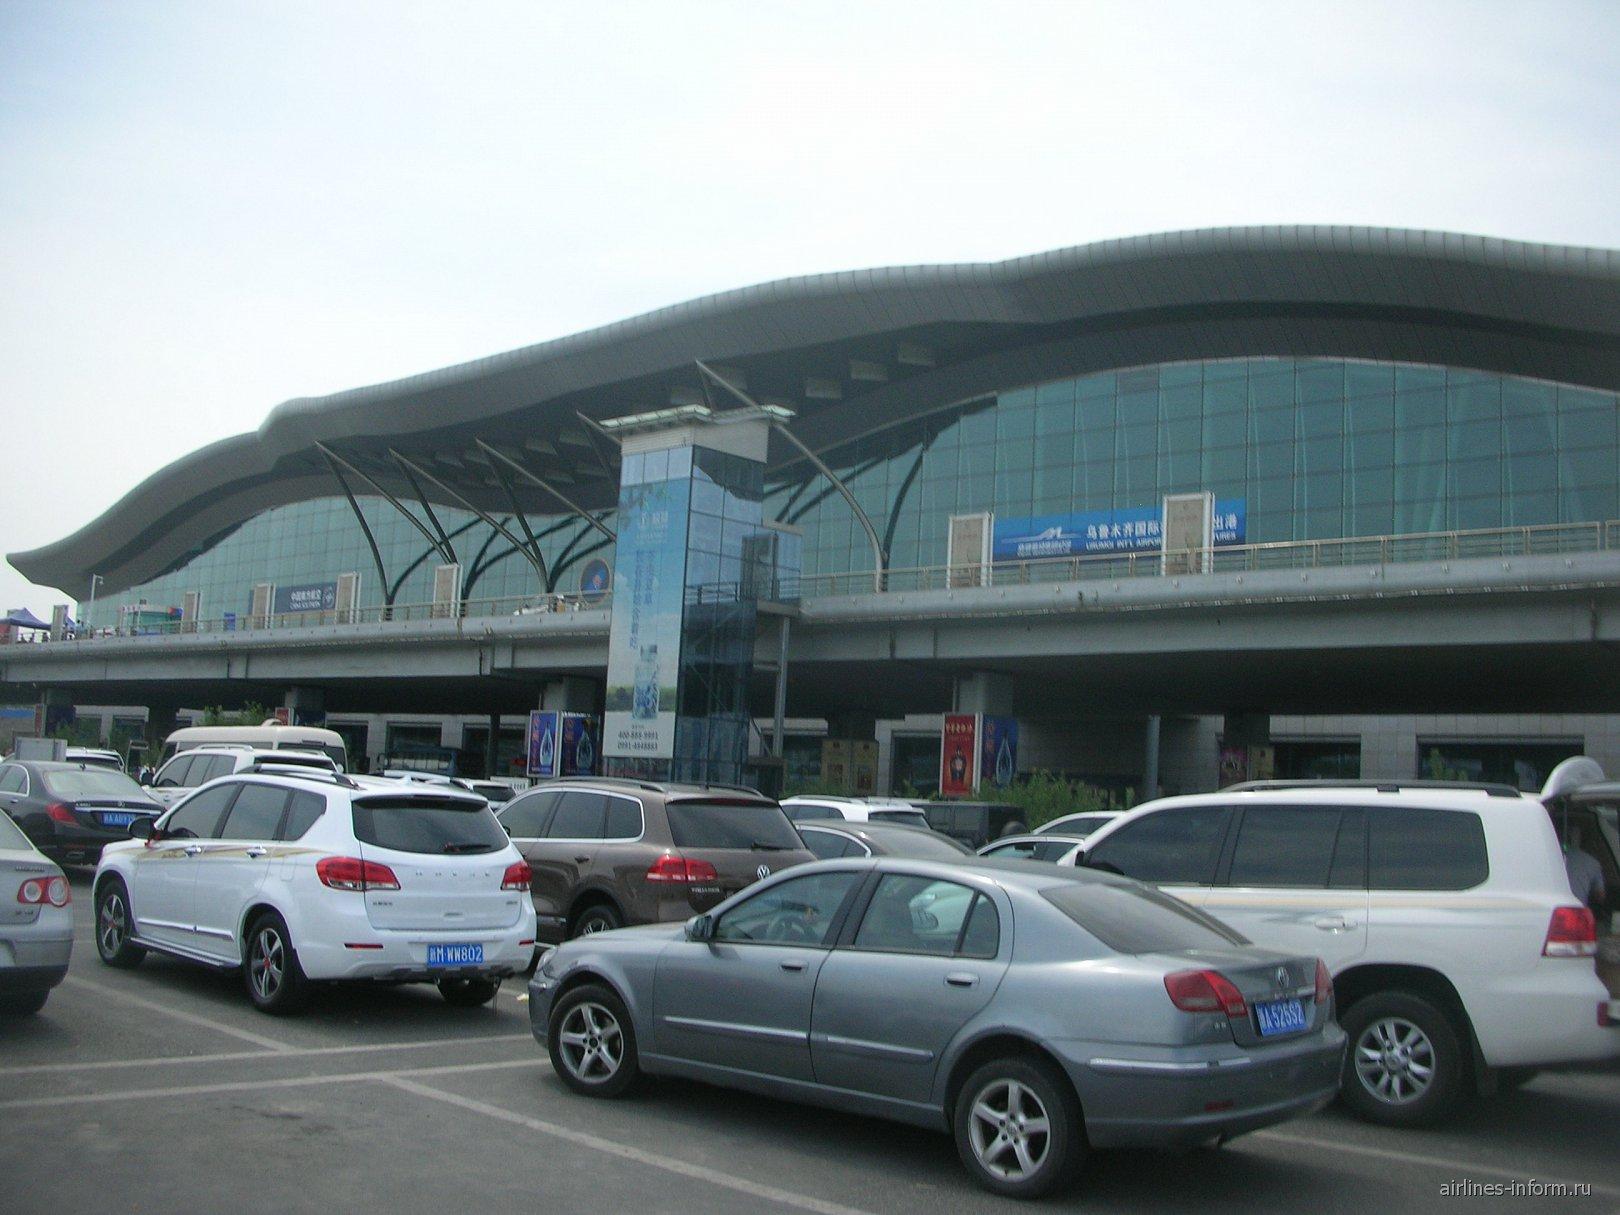 Аэровокзал аэропорта Урумчи